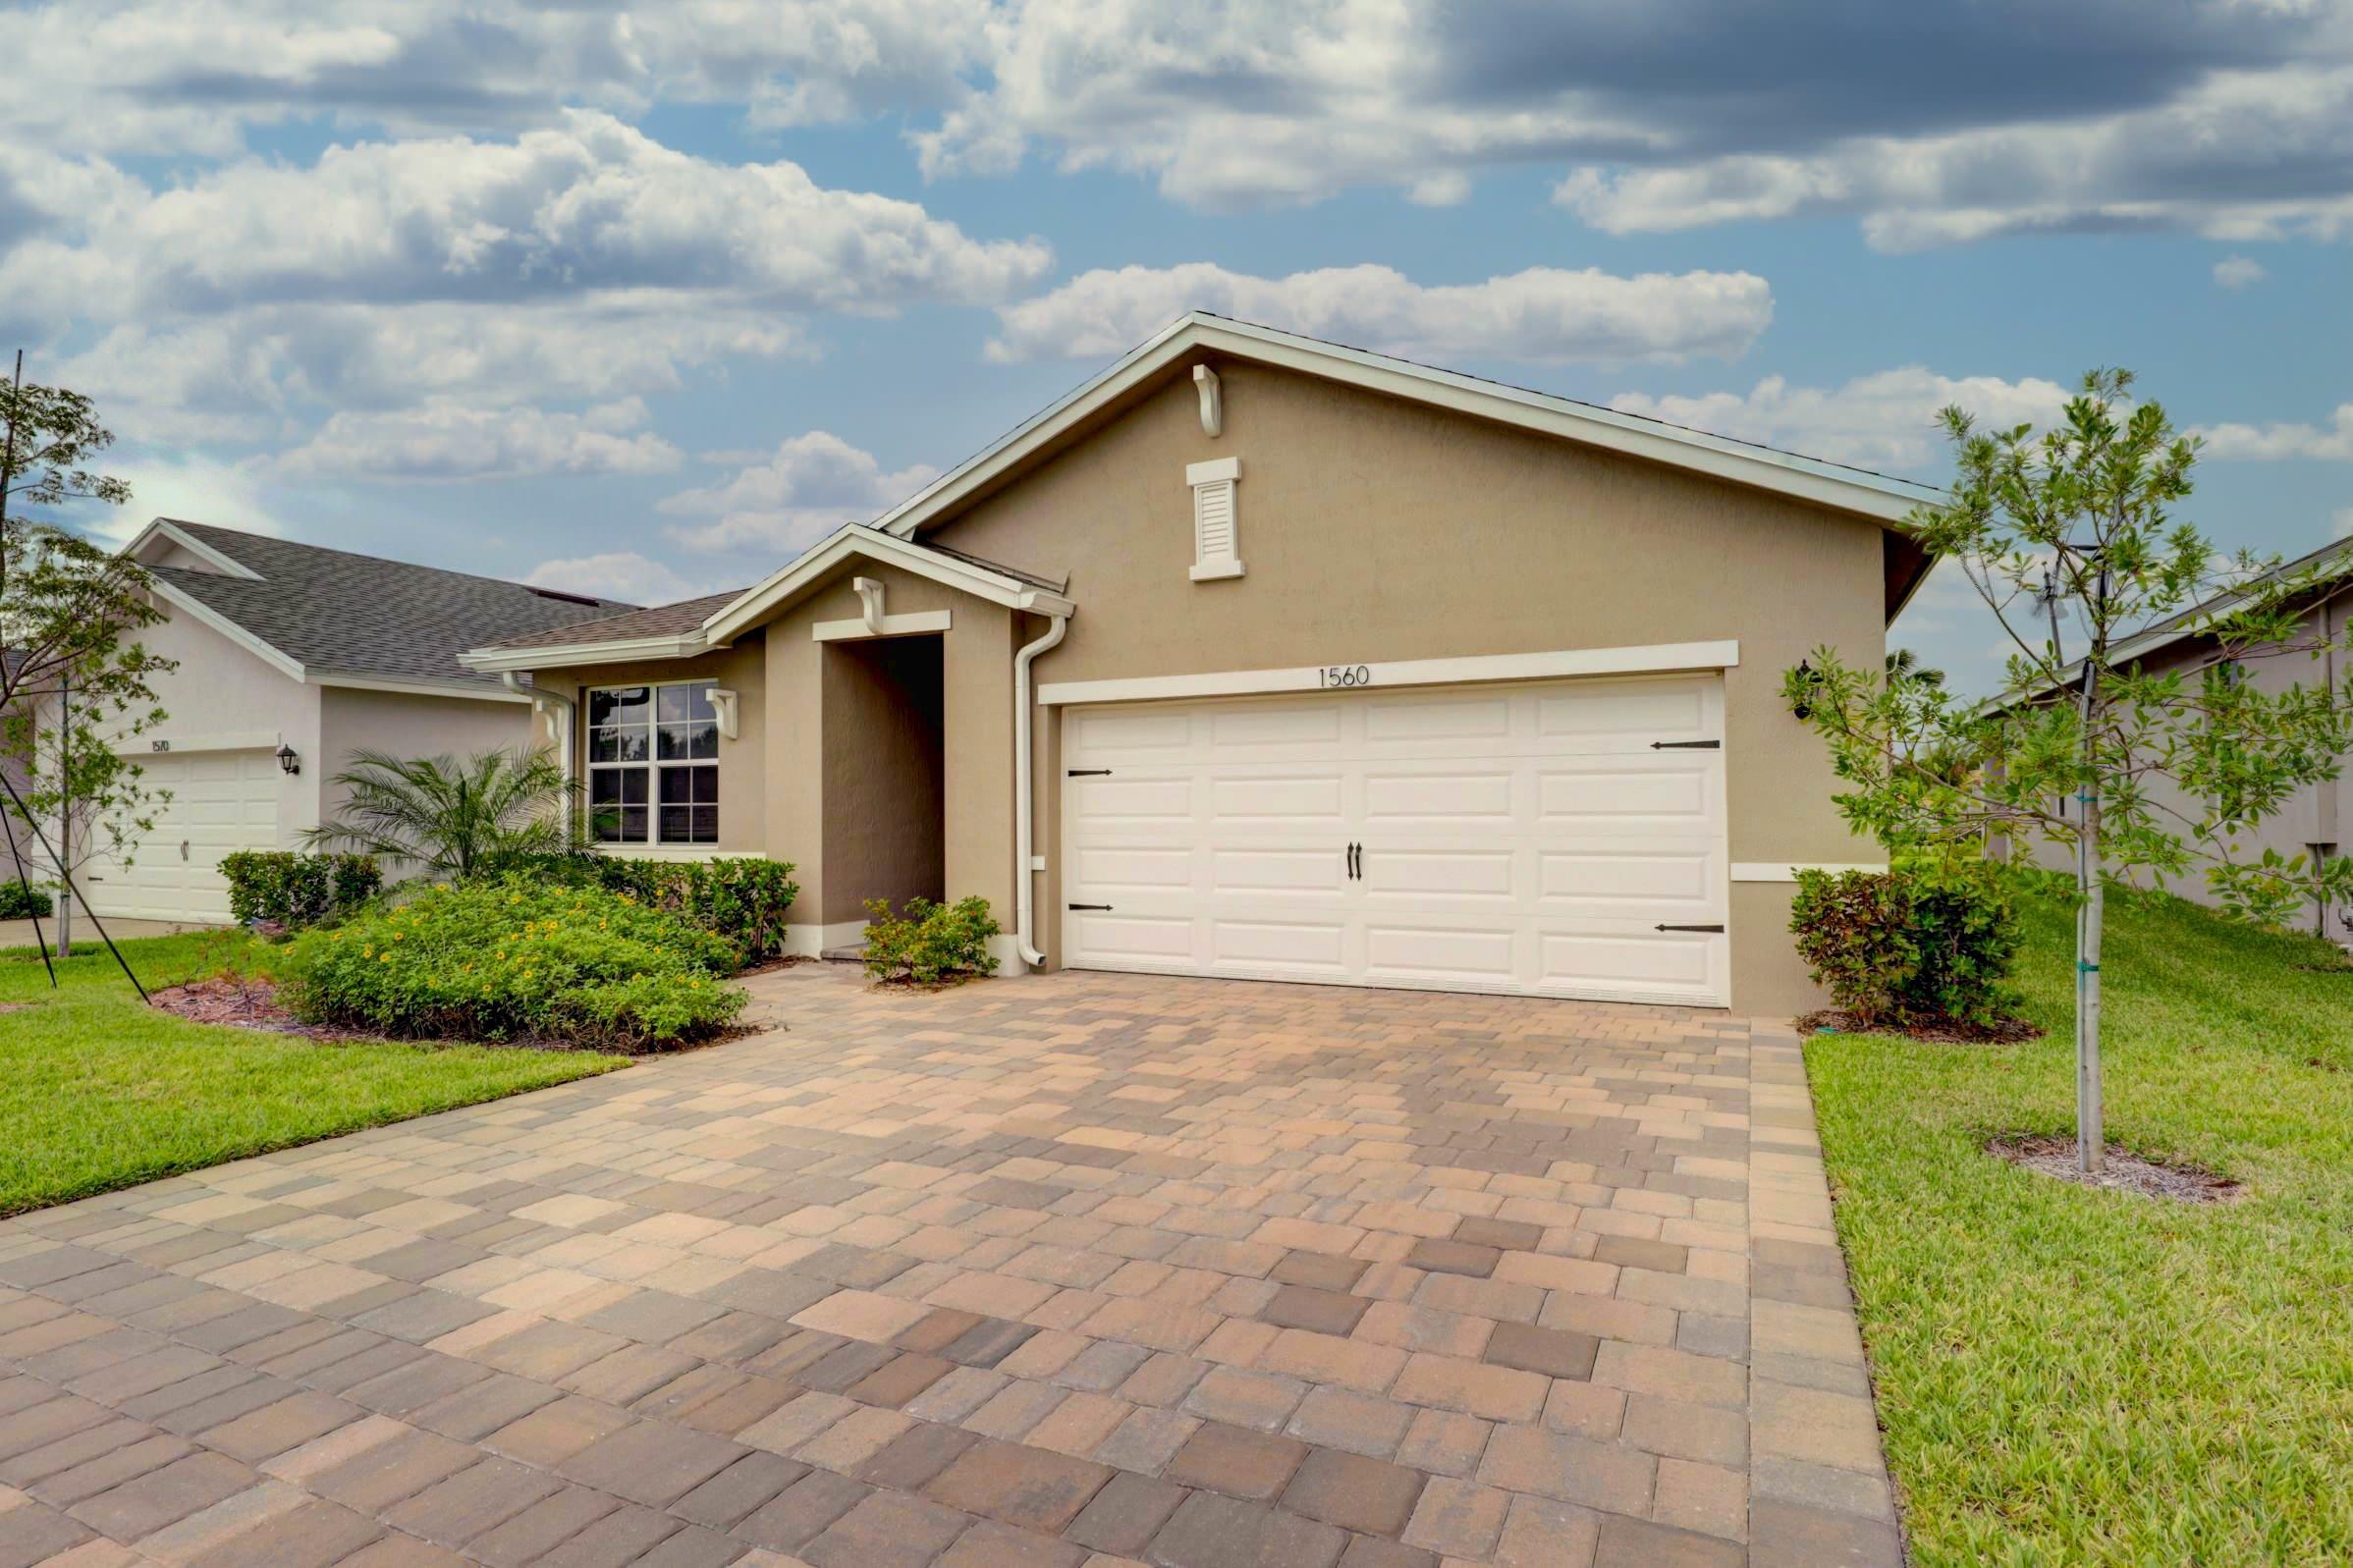 Photo of 1560 NE Skyhigh Terrace, Jensen Beach, FL 34957